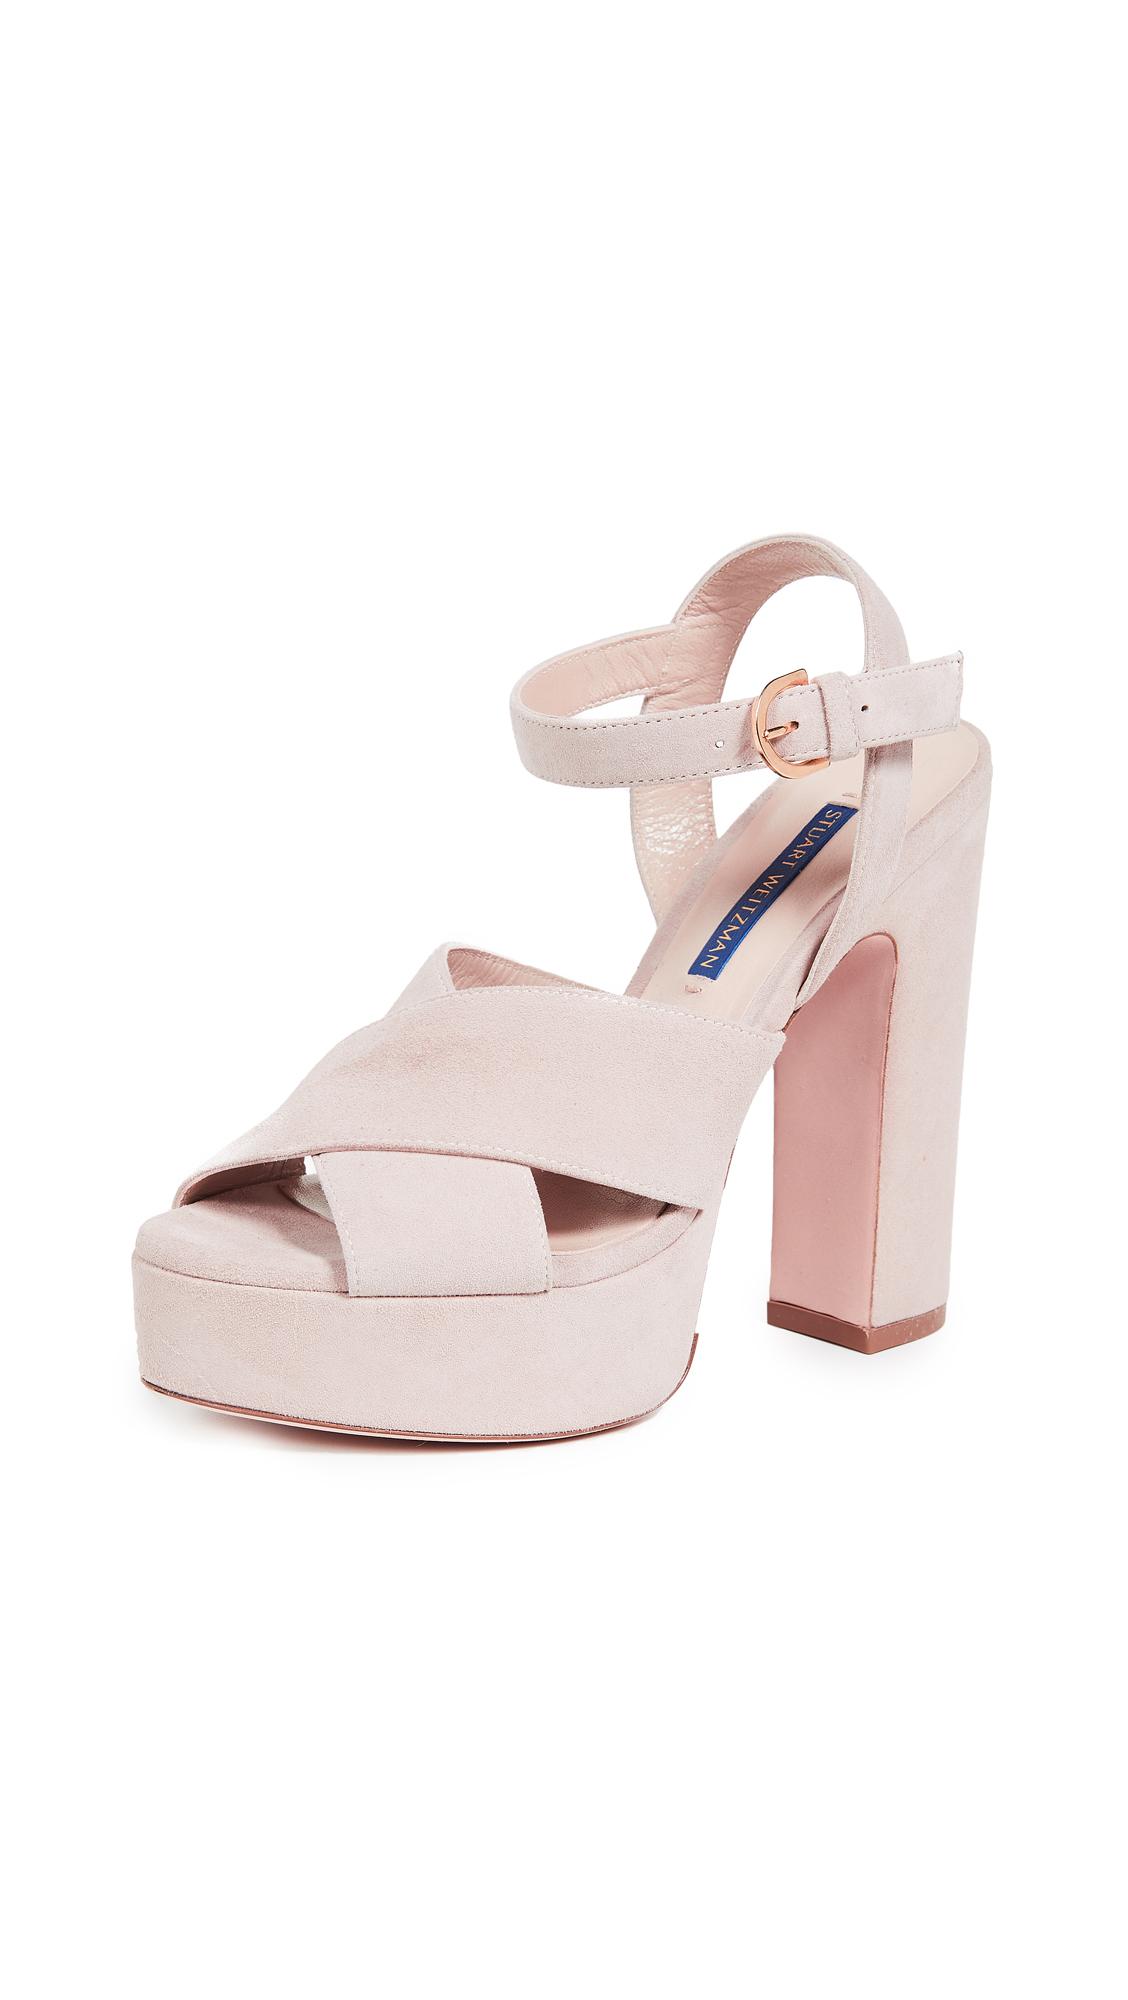 Stuart Weitzman Joni Platform Sandals - Dolce